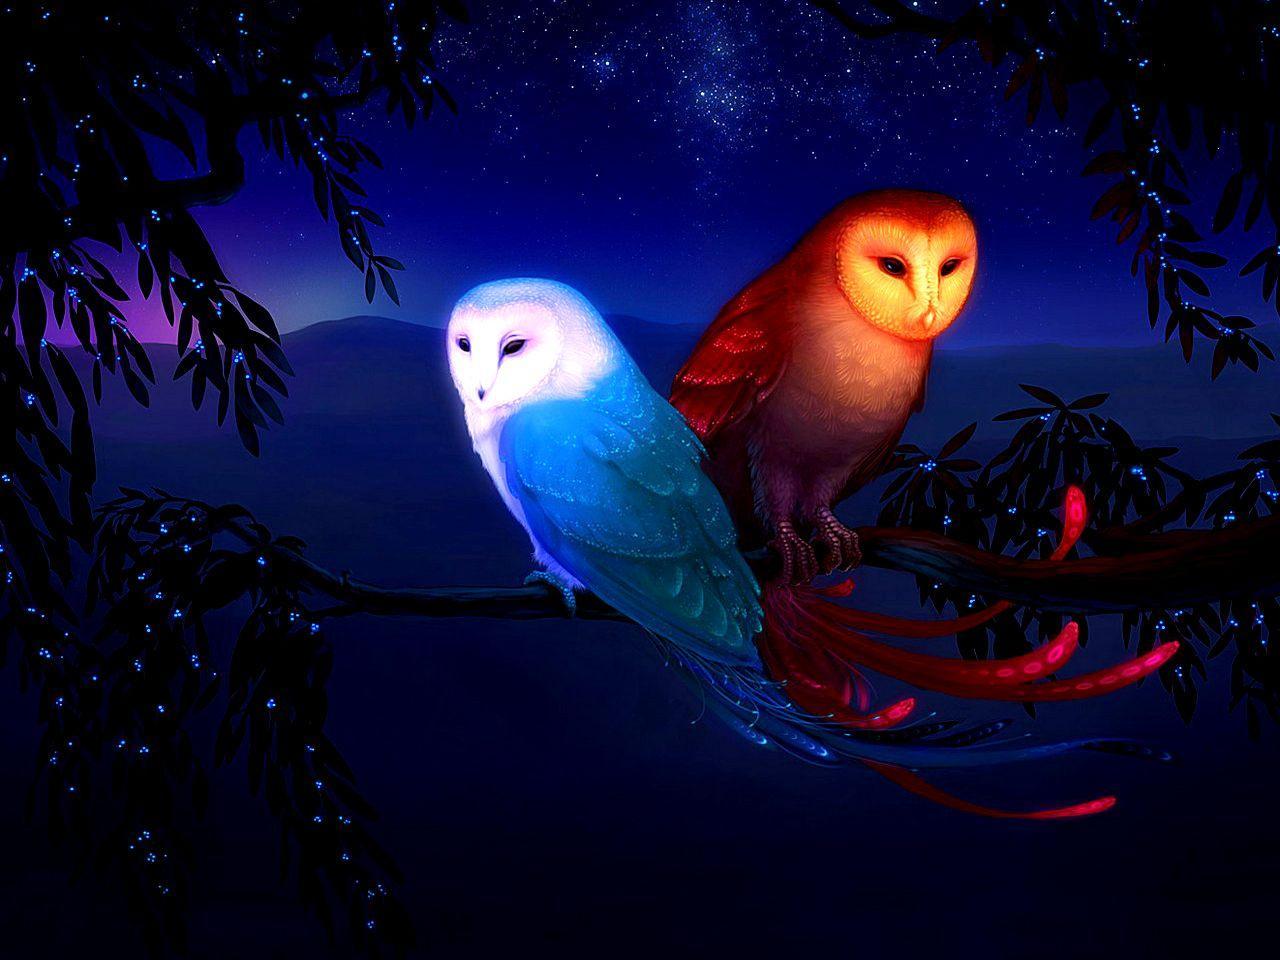 Beautiful Owl Wallpapers Top Free Beautiful Owl Backgrounds Wallpaperaccess